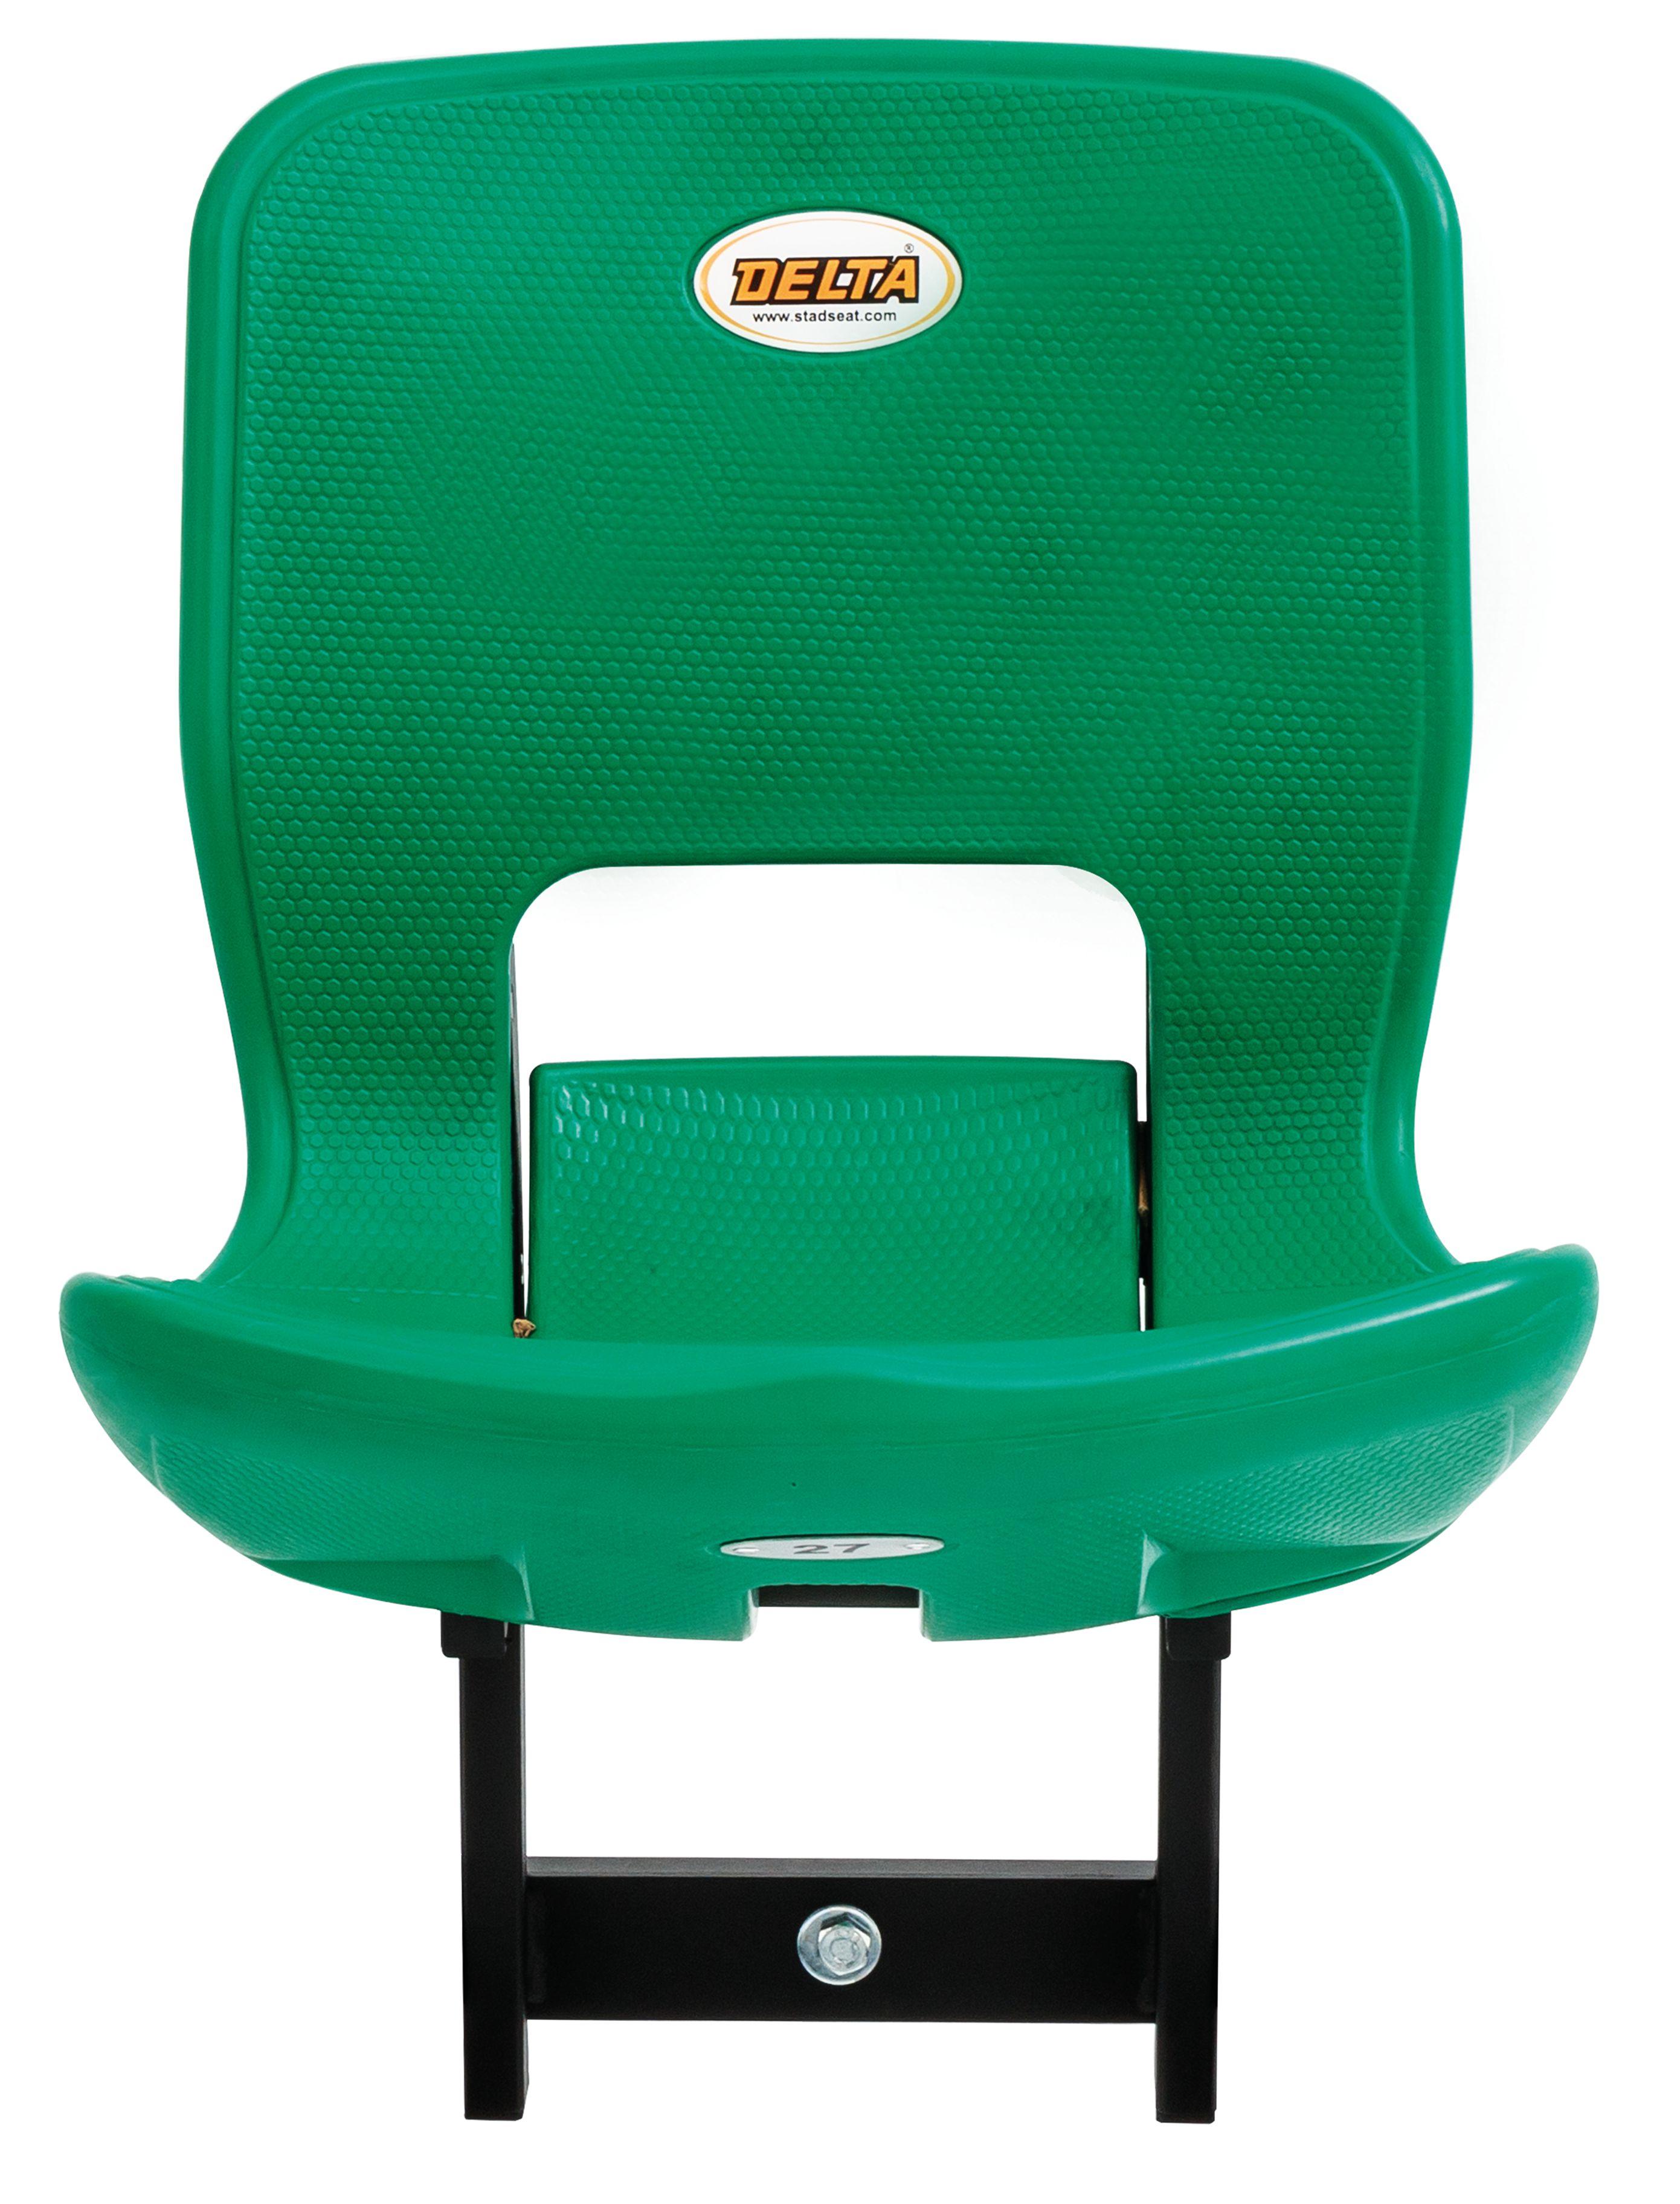 linea_backrest_monoblock_copolymer_pp_stadium_chair_seatorium_41